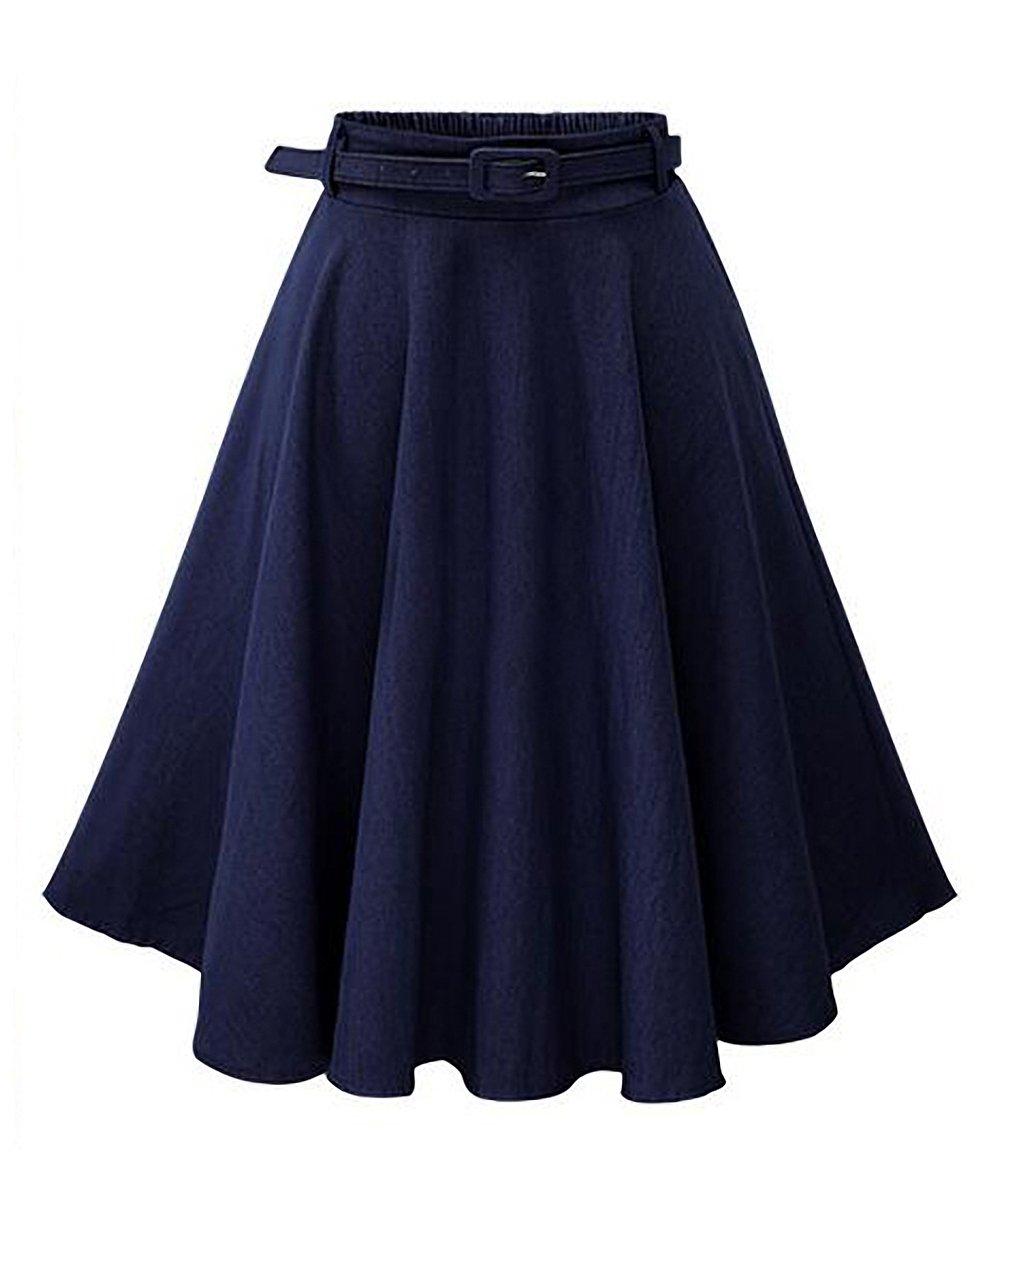 Women's Summer High Stretchy Waist A Line Full Swing Casual Denim Midi Skirt with Belt (Navy)